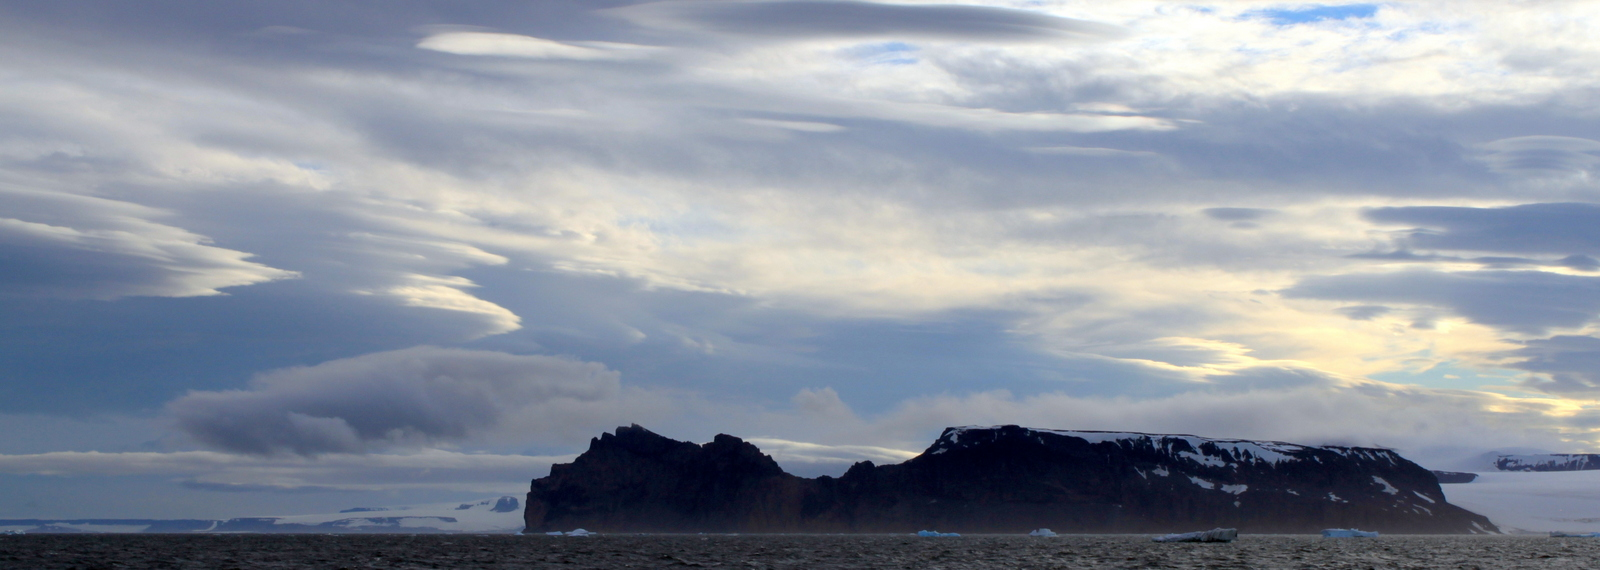 Antarctica, Insane clouds